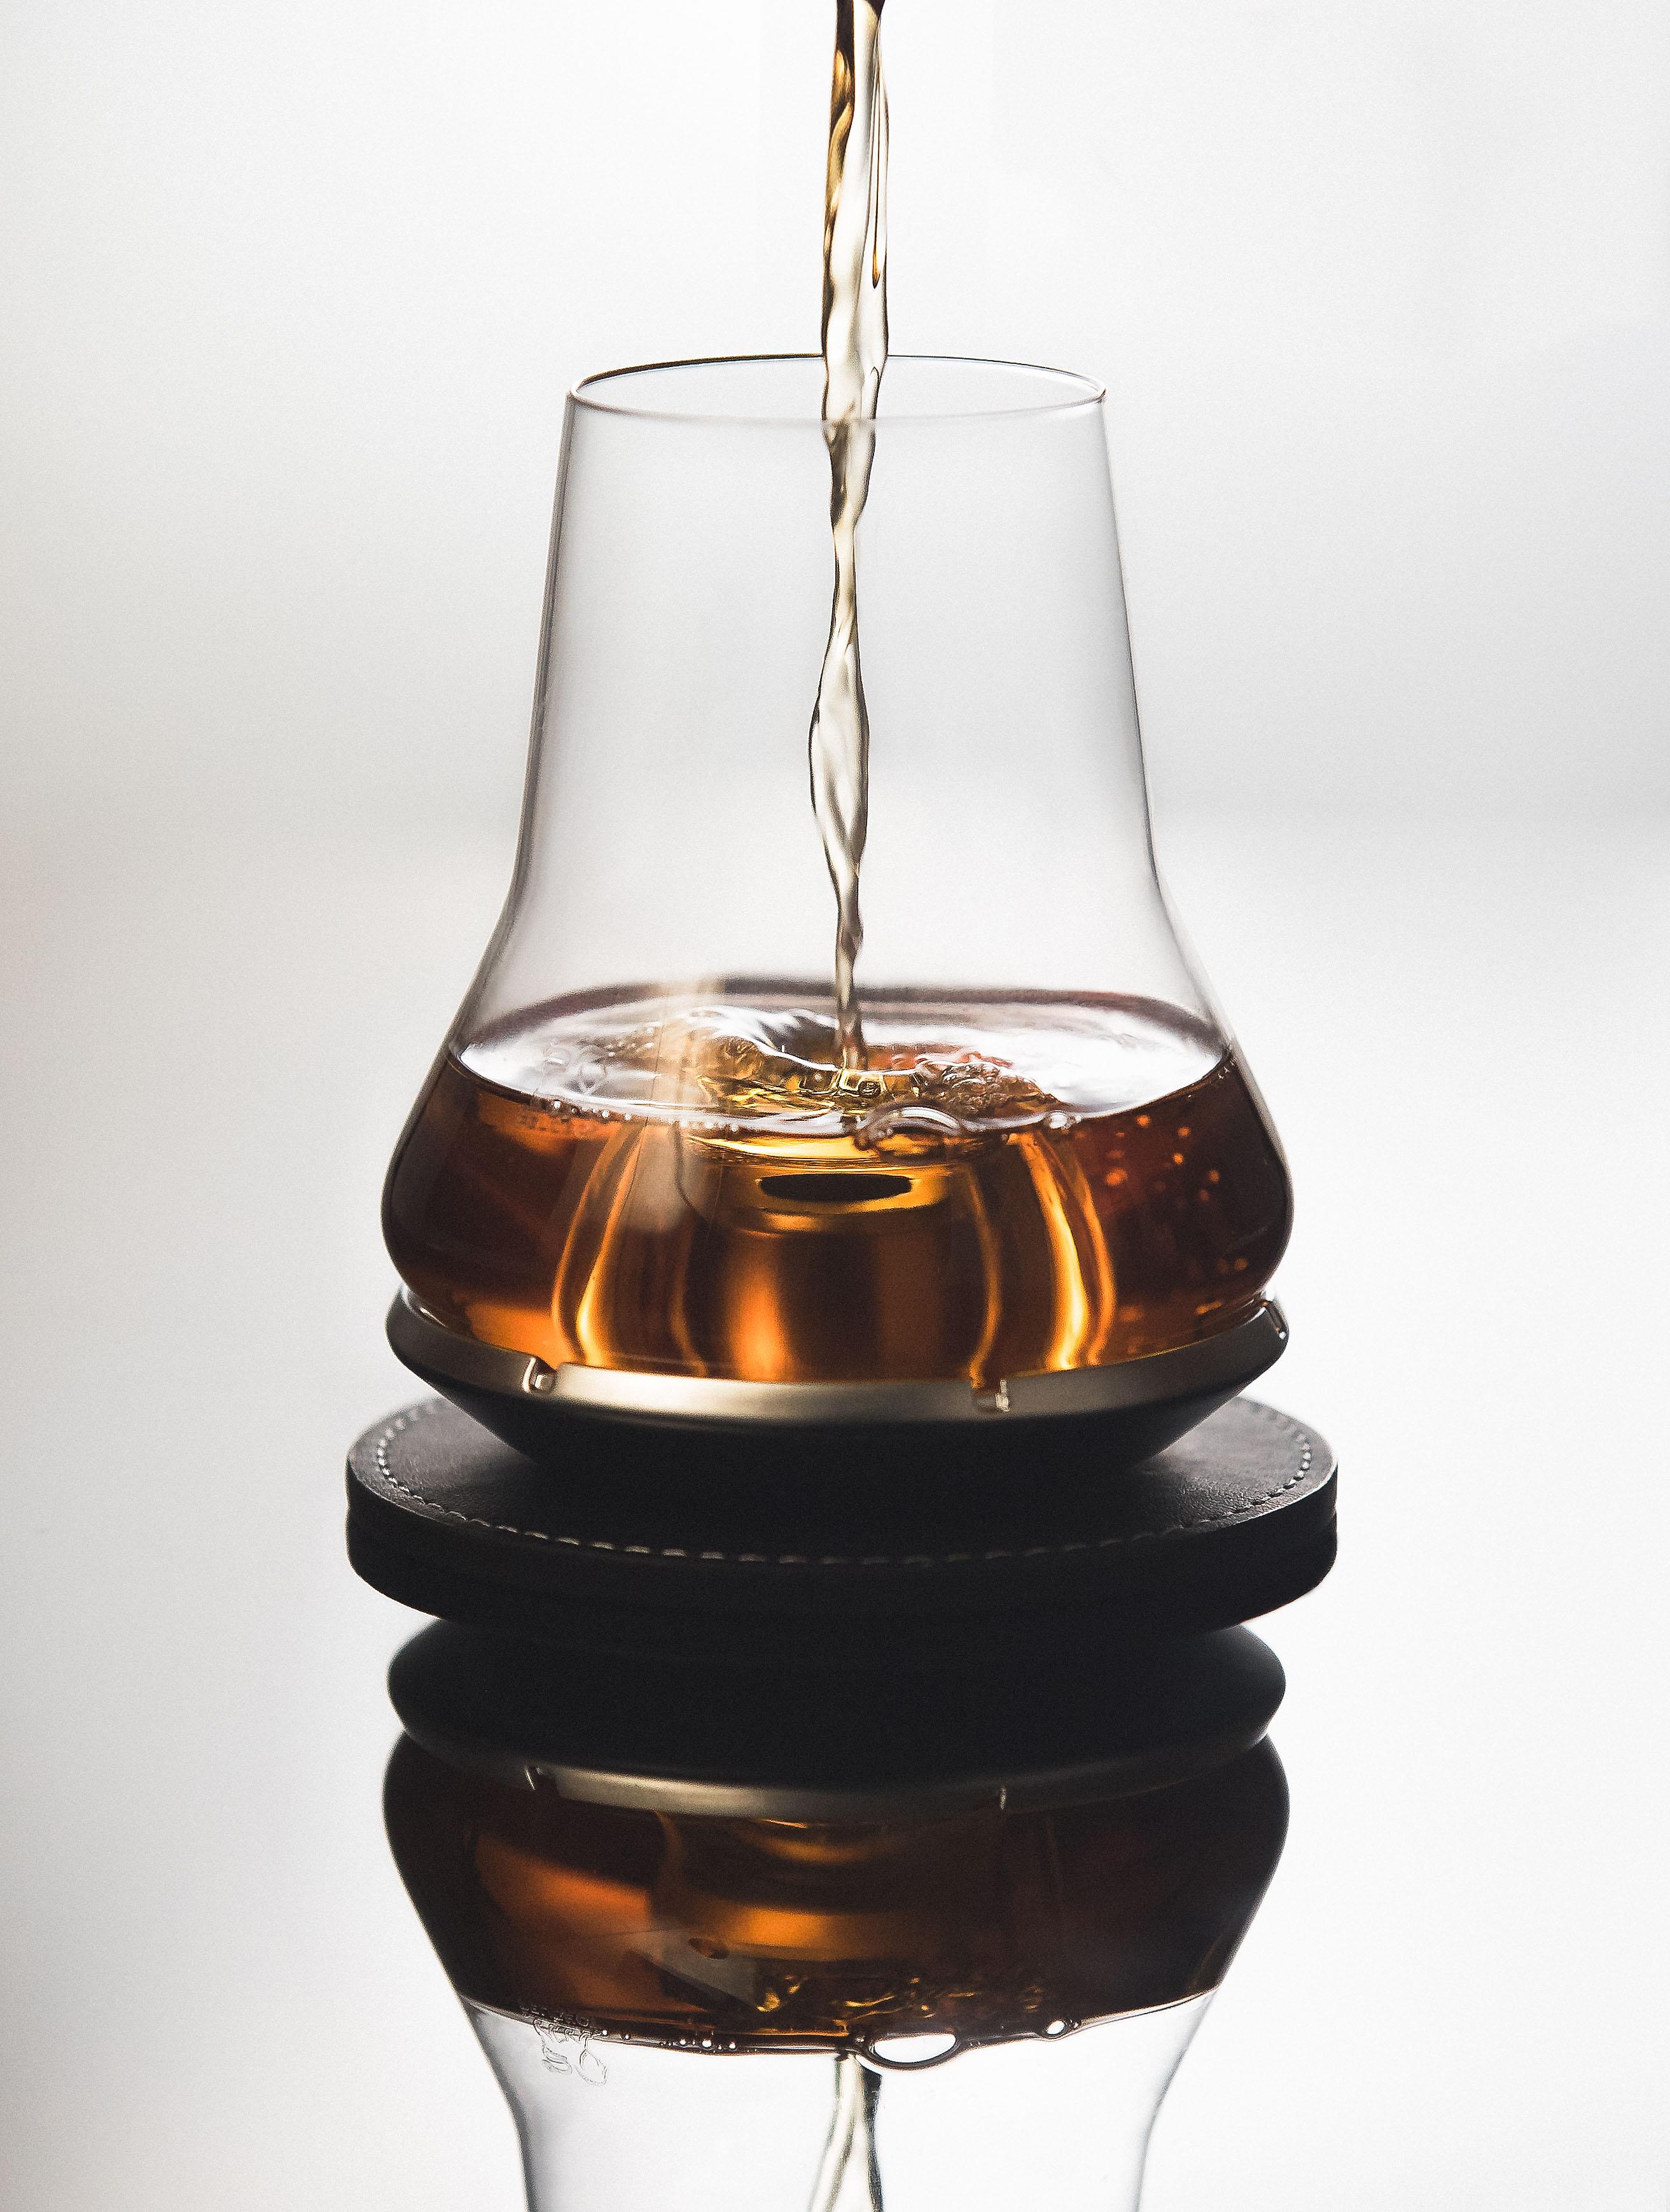 Verre Impitoyable Whisky Peugeot